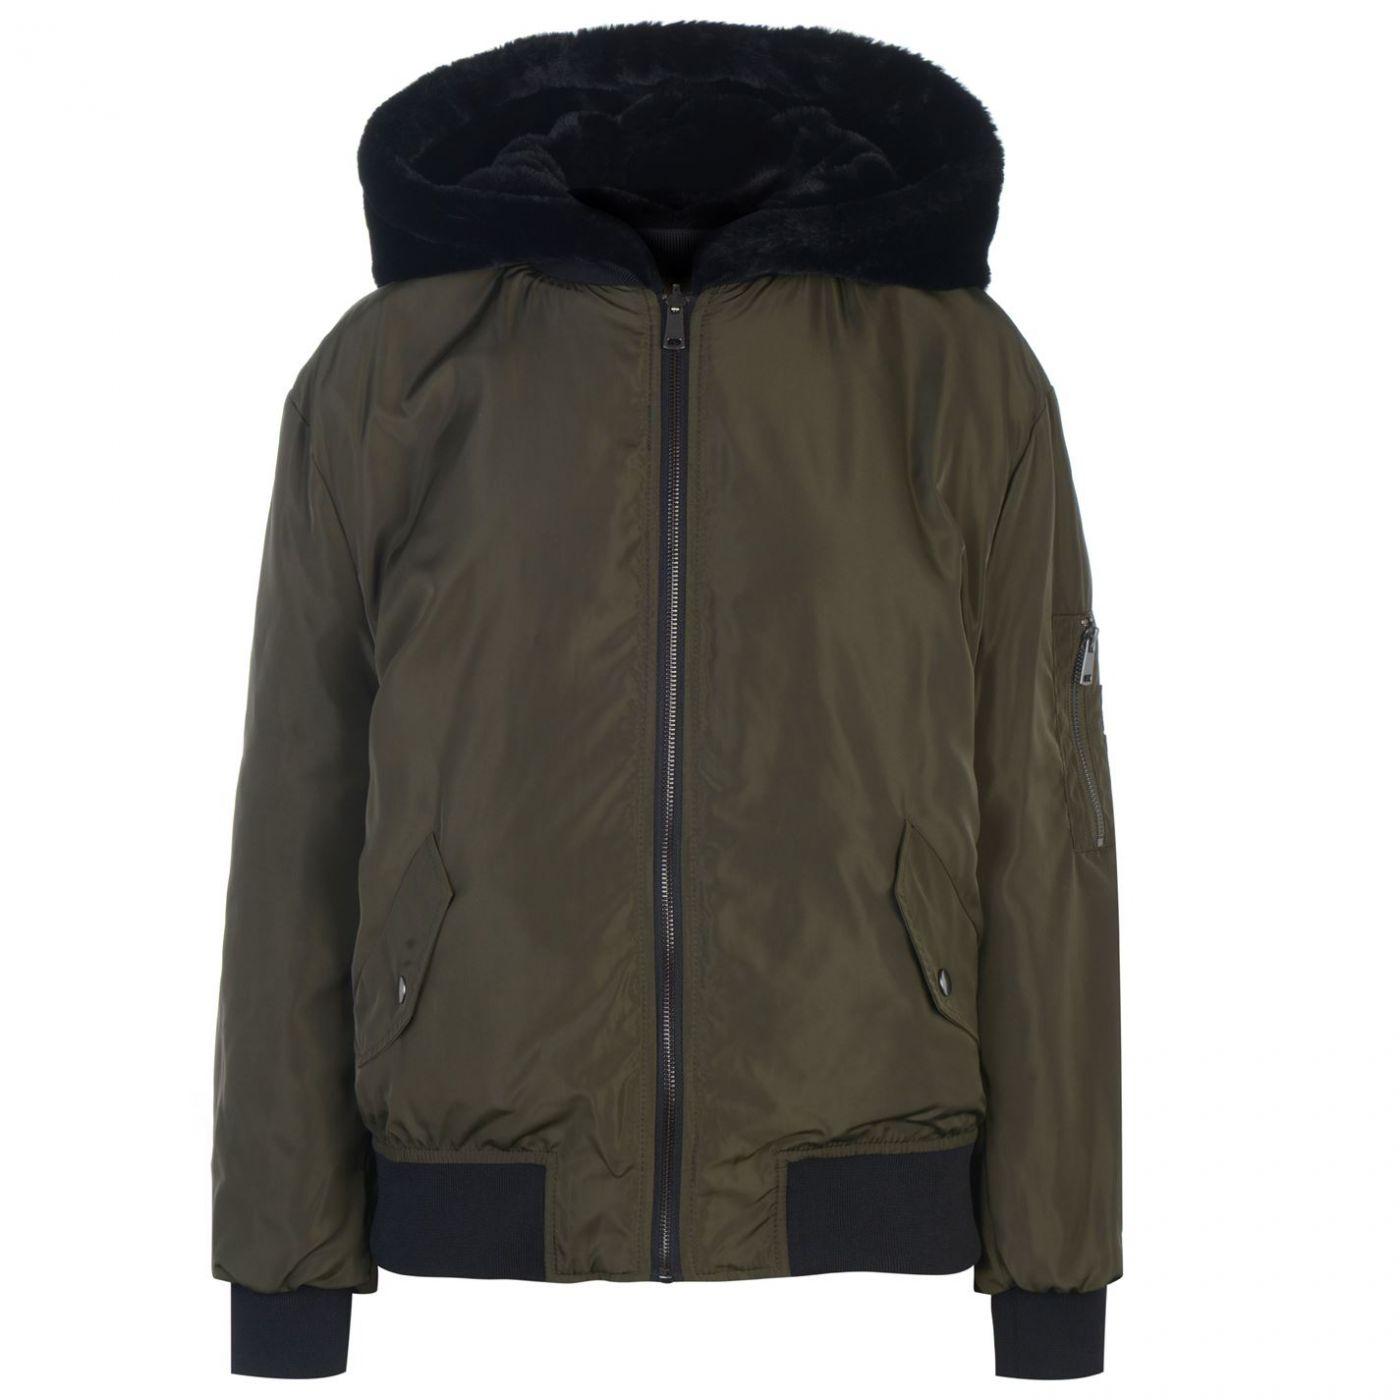 JDY Kacy Reverse Jacket